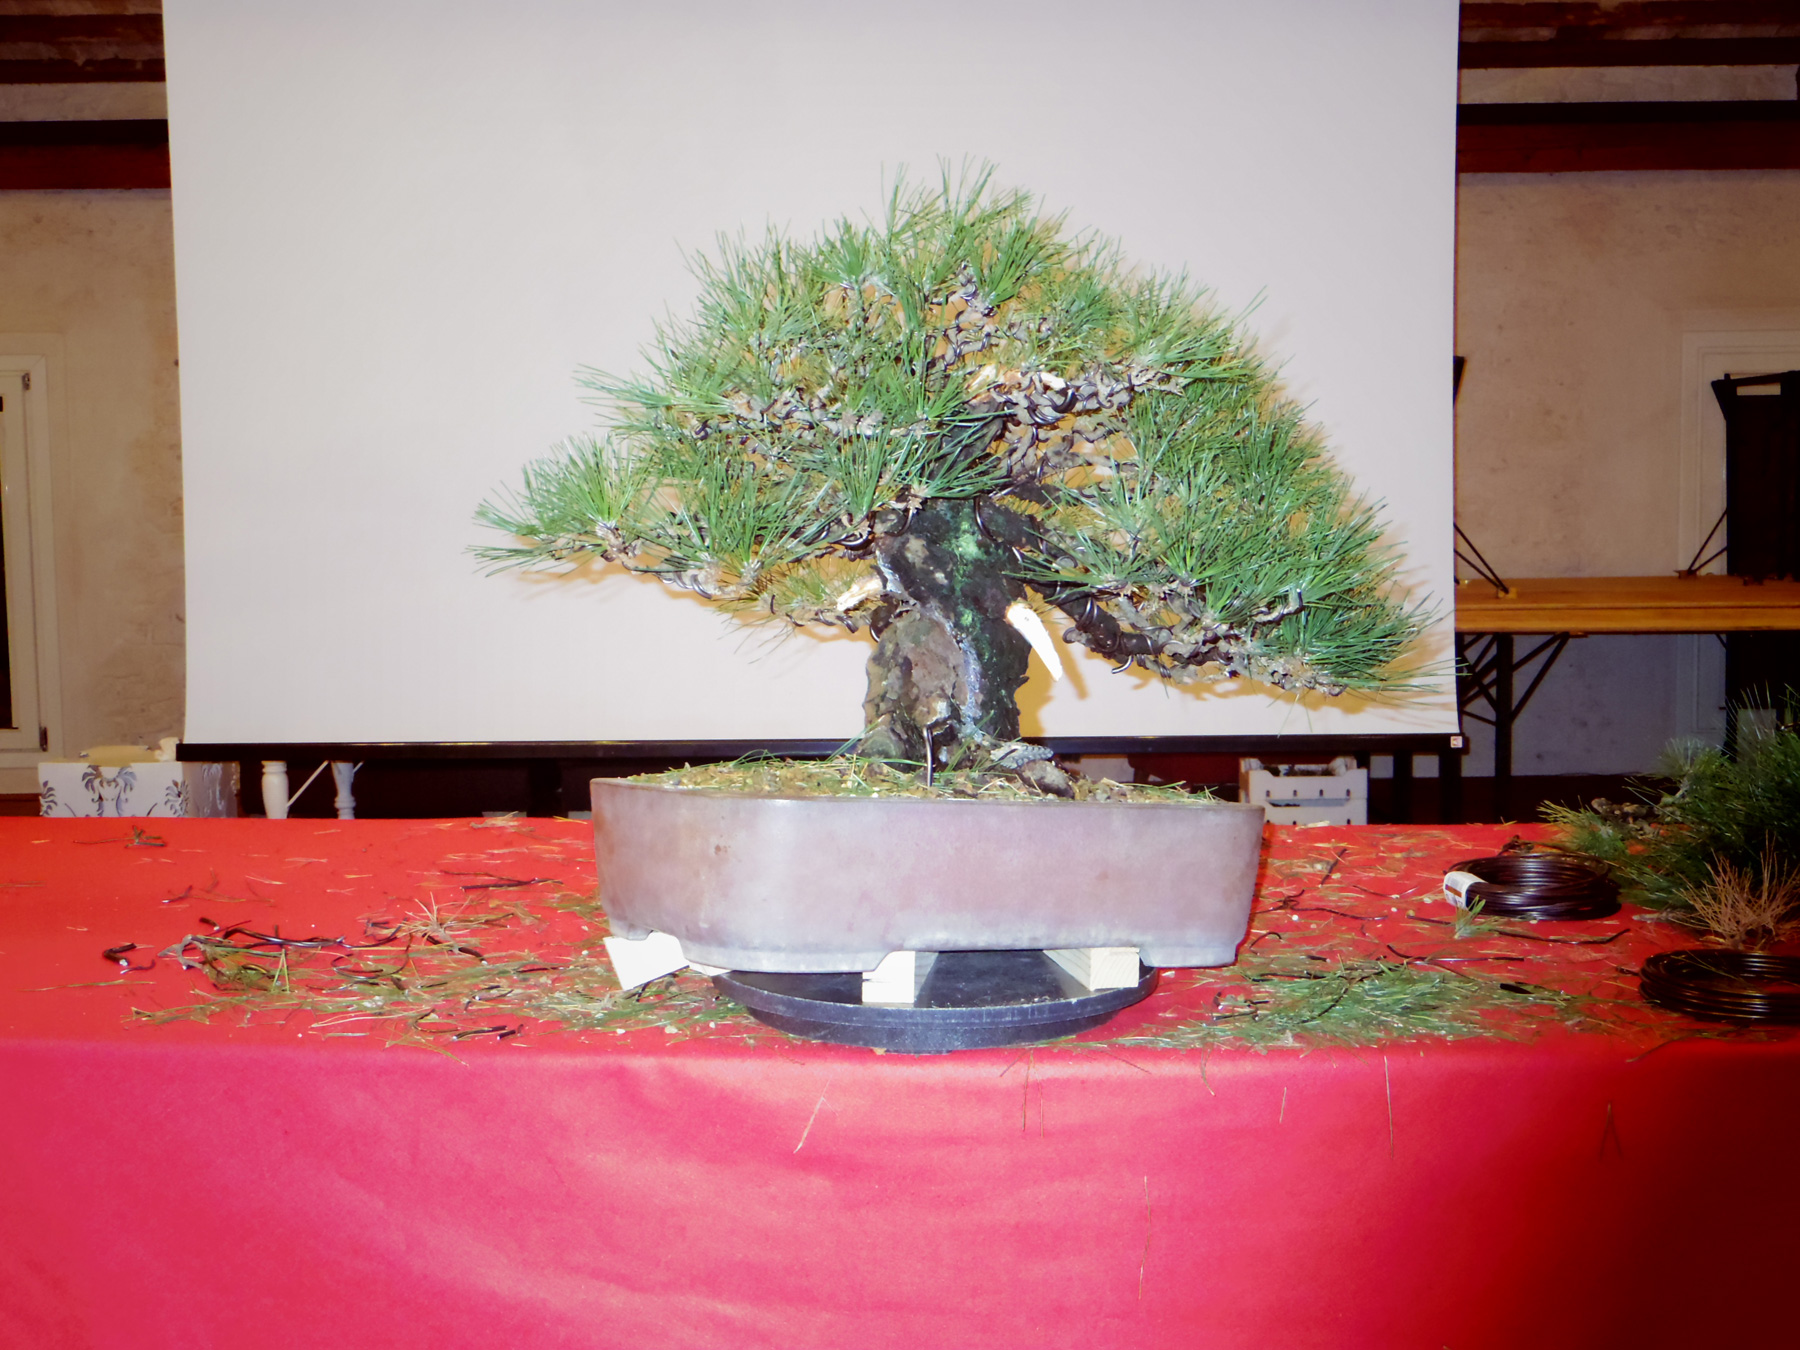 Bonsai Warrior Bonsai Master Masashi Hirao Ç›†æ½å¸« Ź³å°¾æˆå¿—